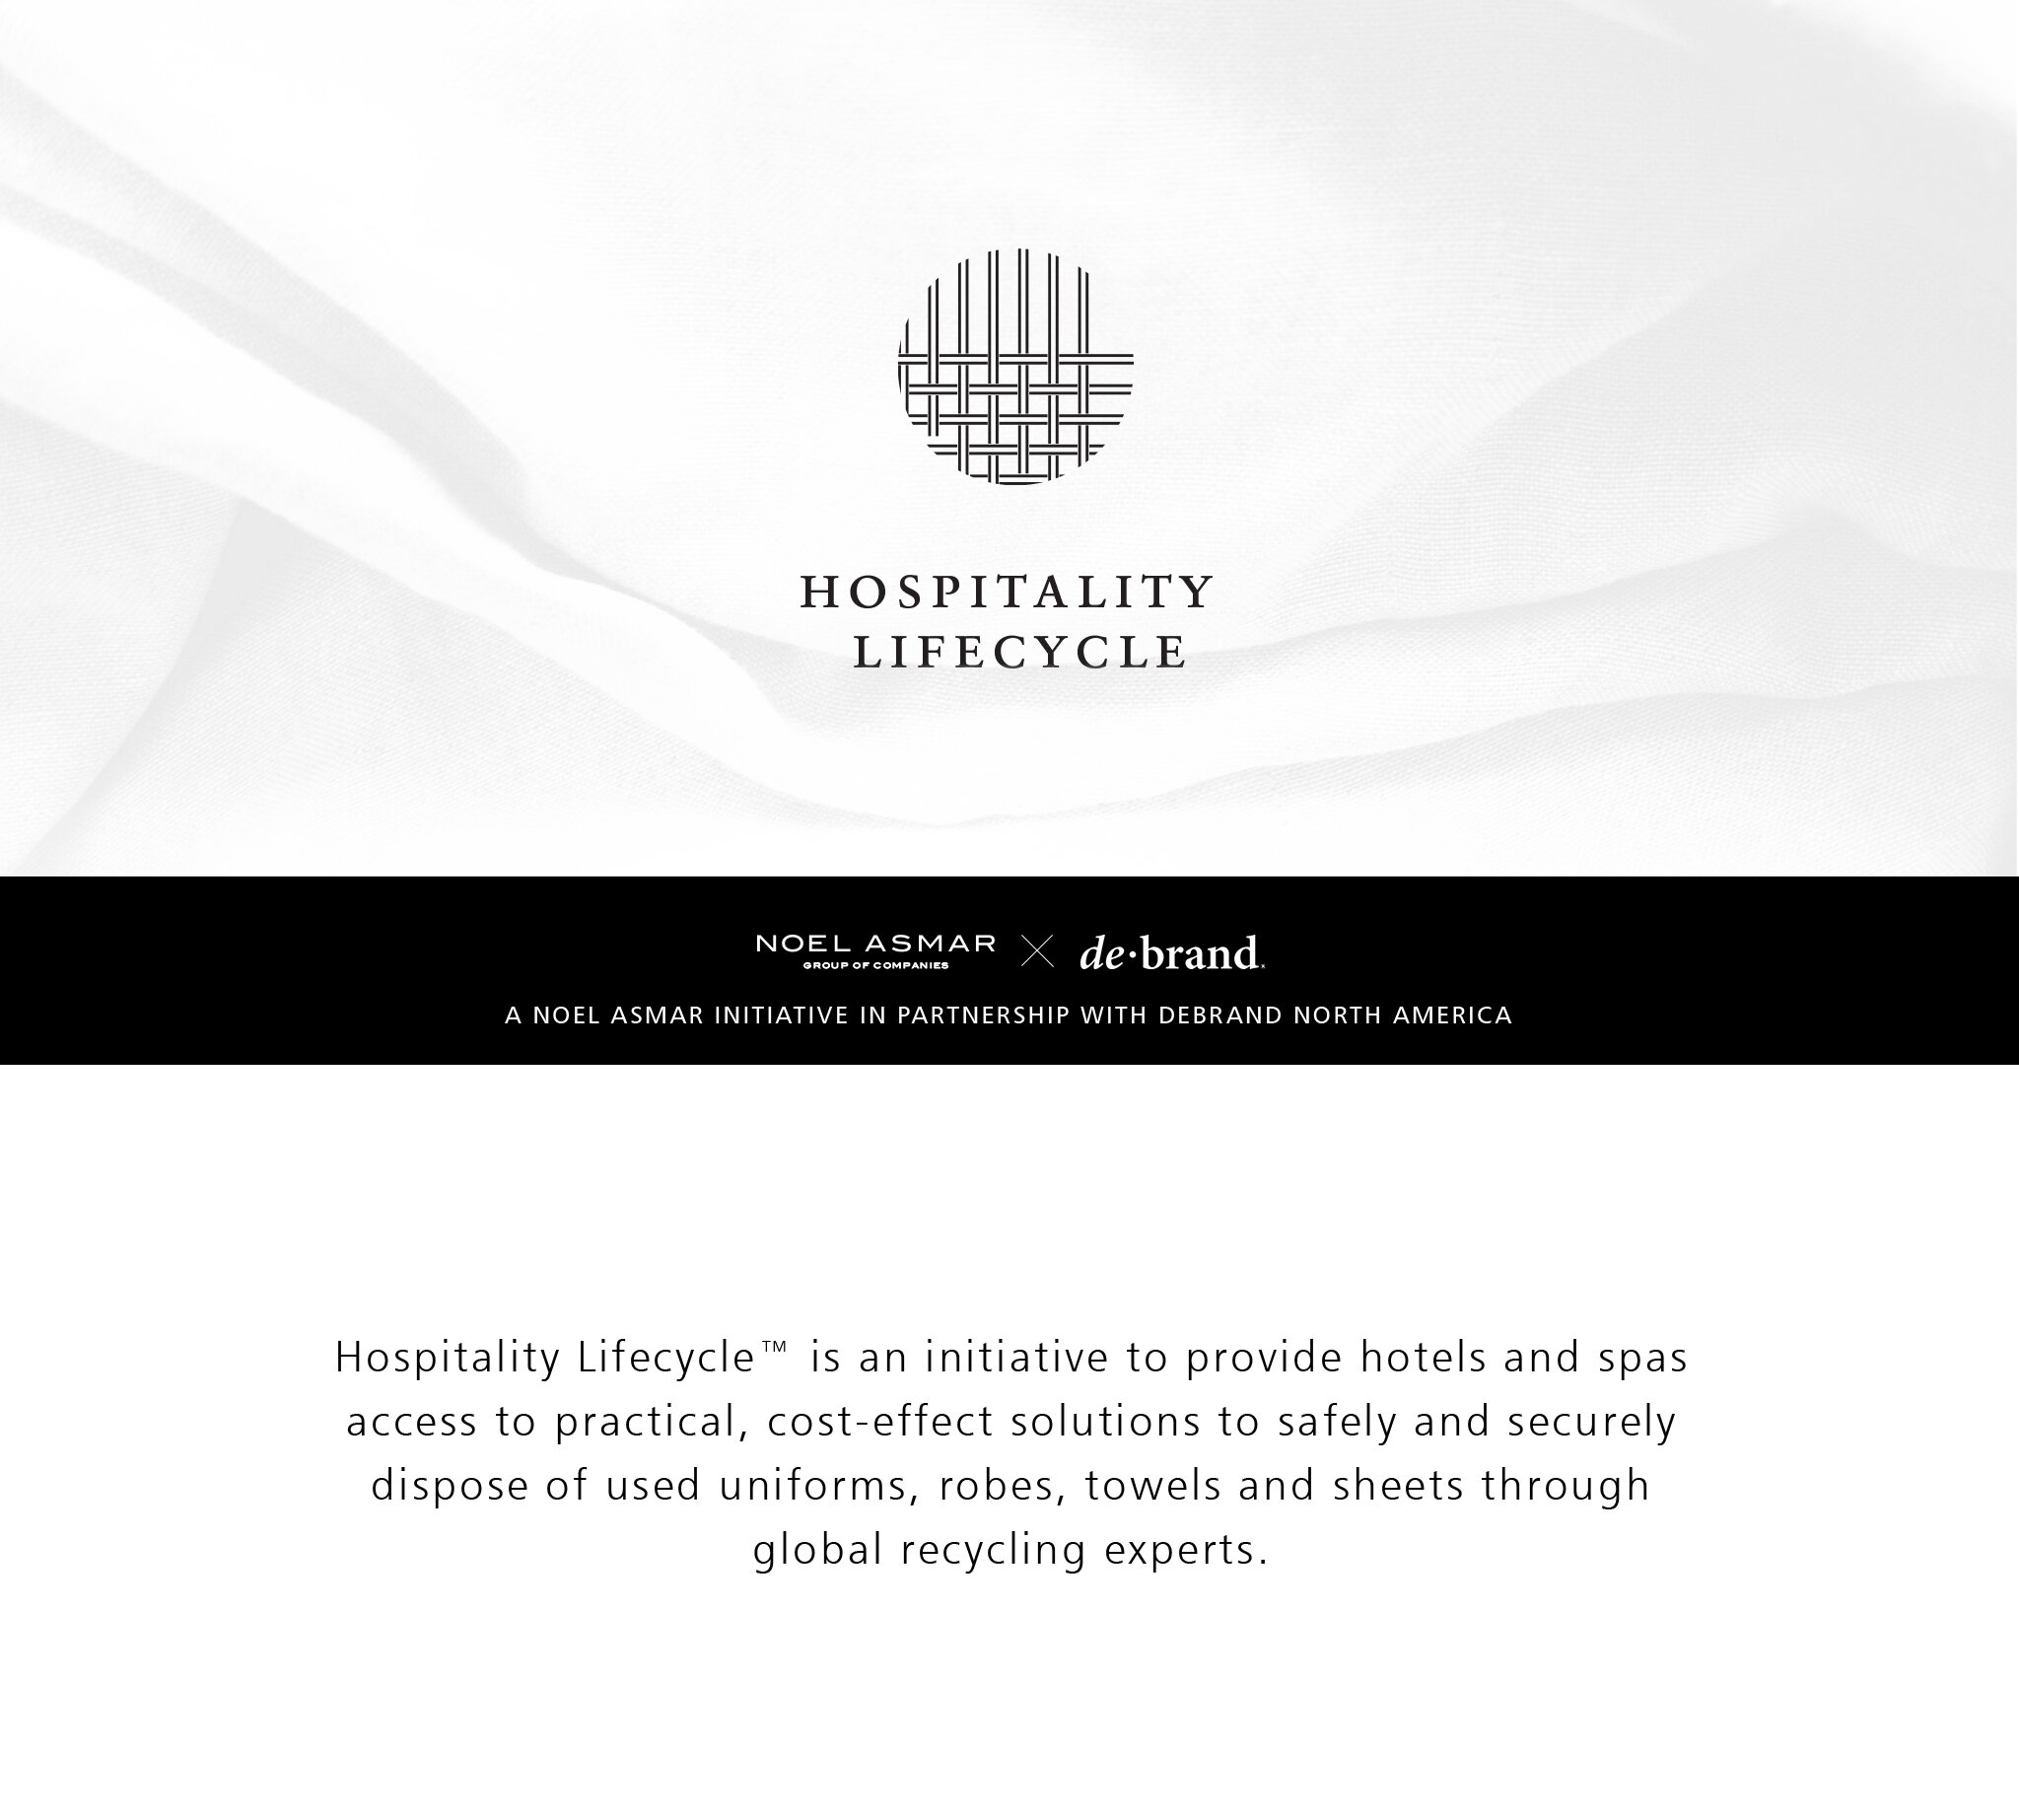 10_11_19-HospitalityLifecycle-For-Debrand_Proof_02.jpg